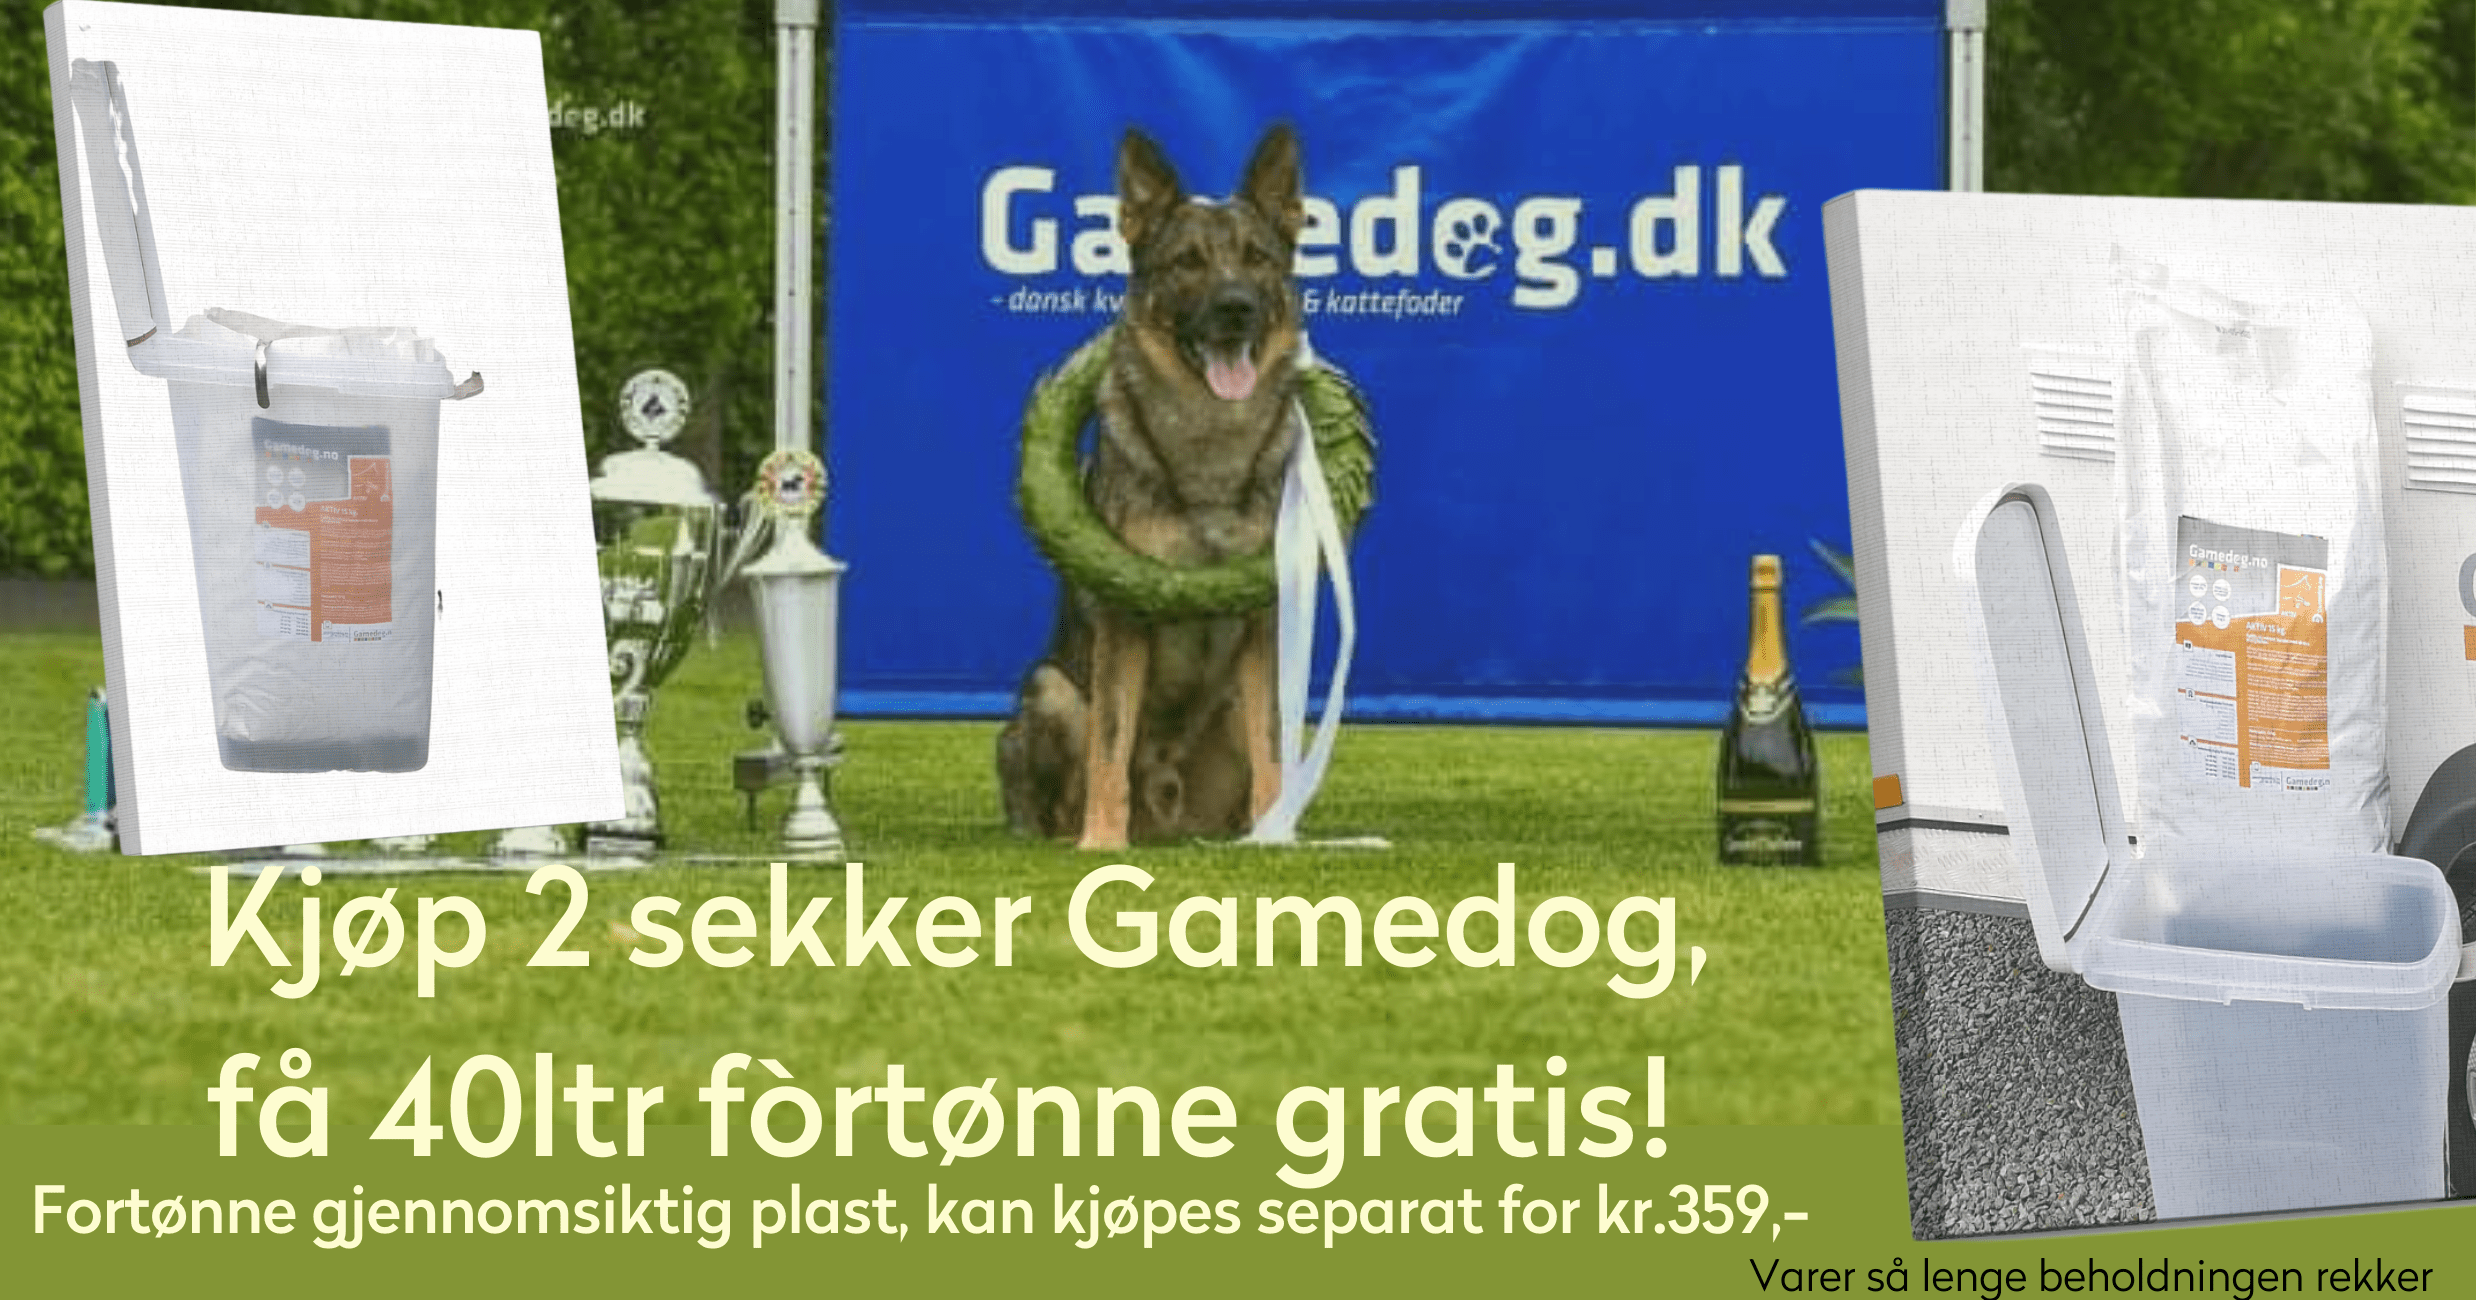 Tropehagen Gamedog